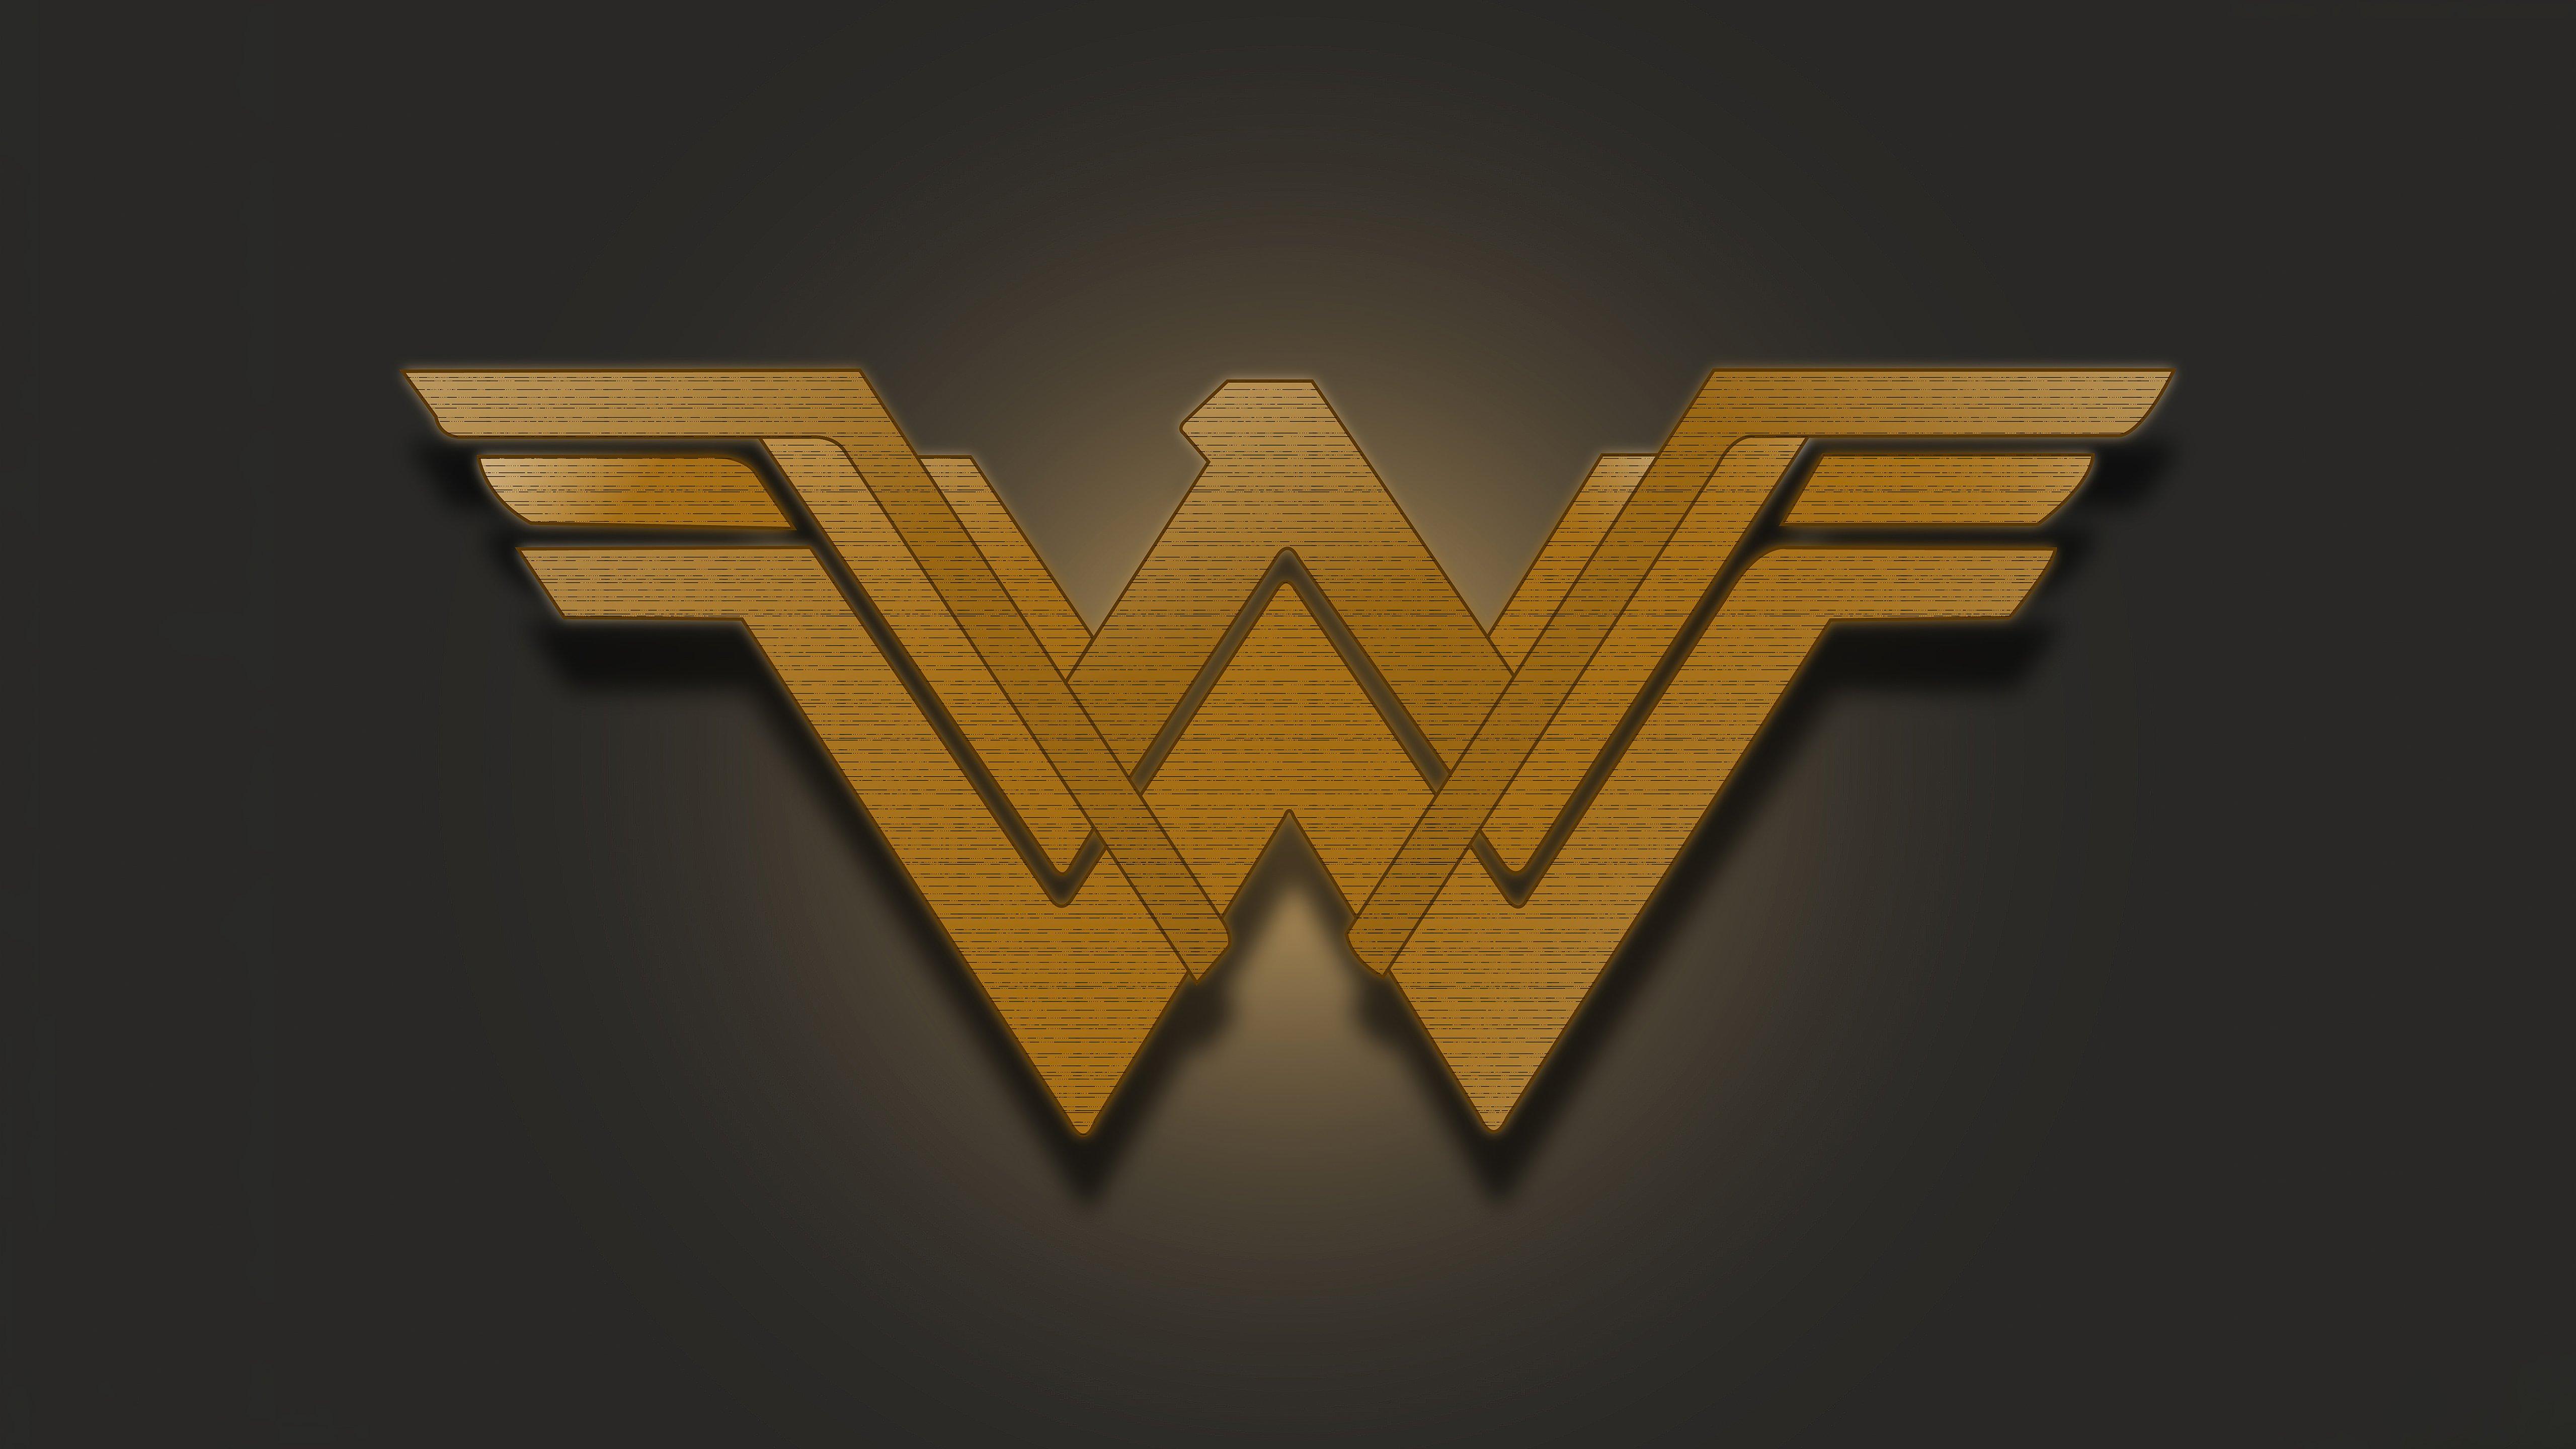 Wallpaper Wonder Woman Emblem